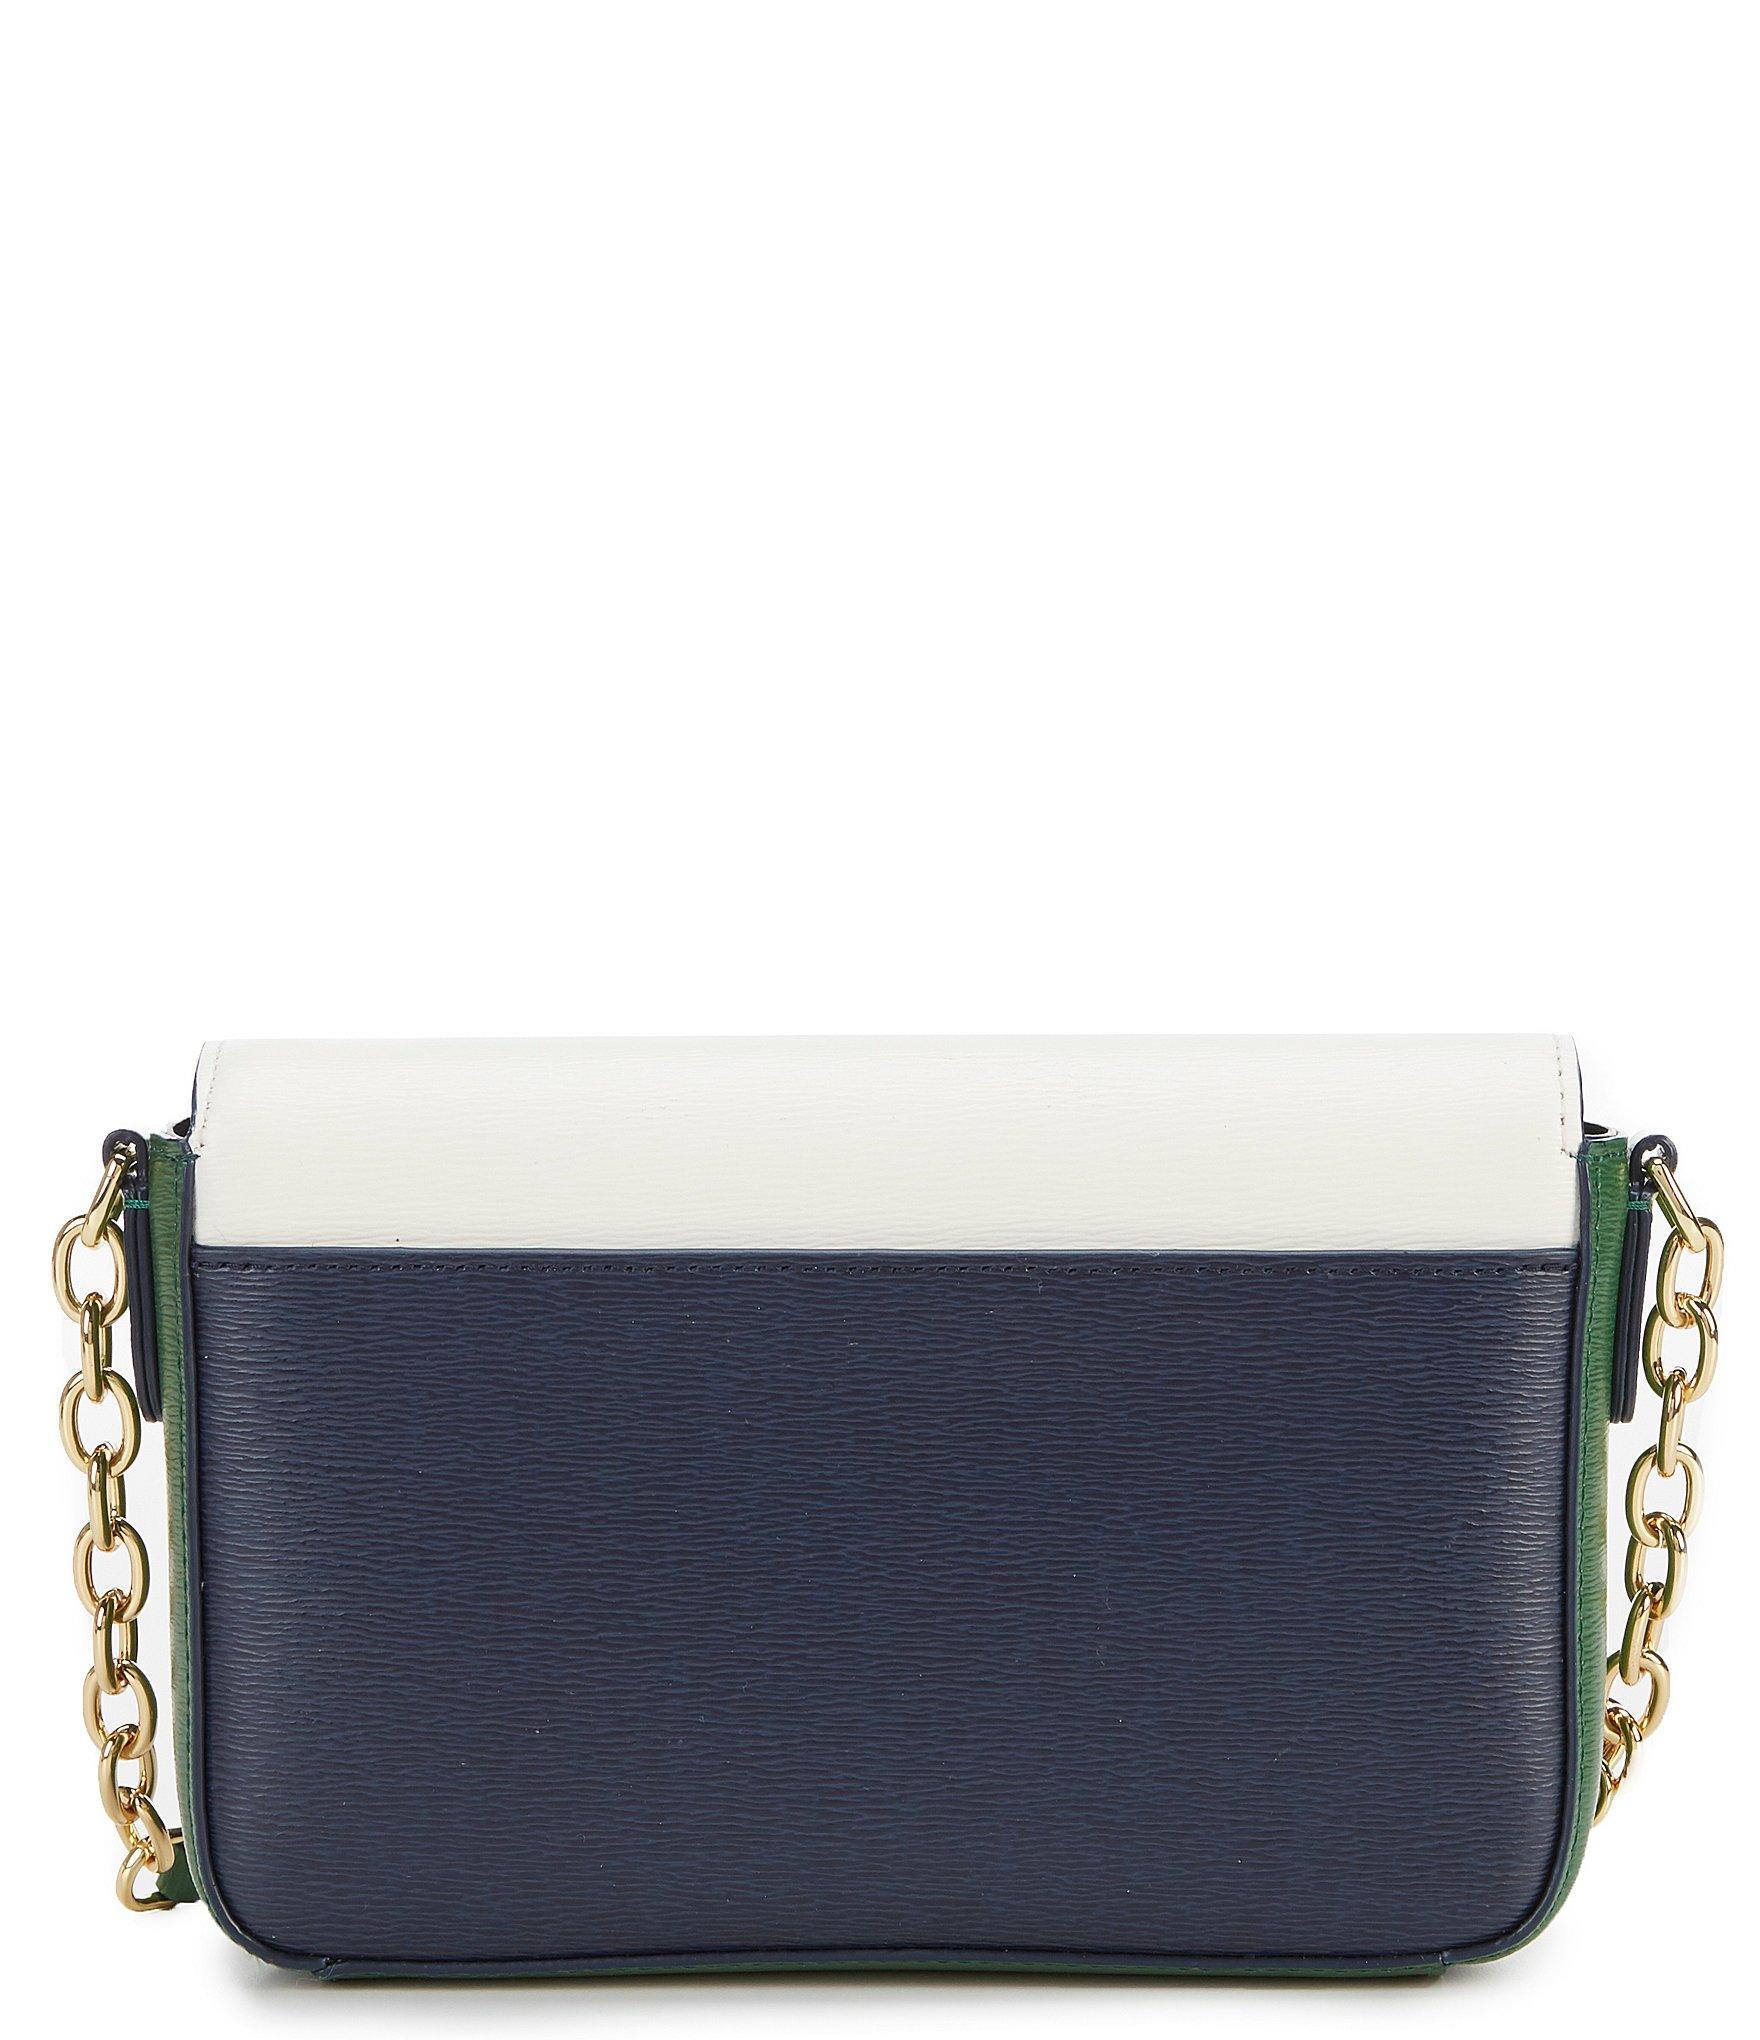 Lauren by Ralph Lauren - Multicolor Medium Colorblock Flap Cross-body Bag -  Lyst. View fullscreen 9c5921c57e